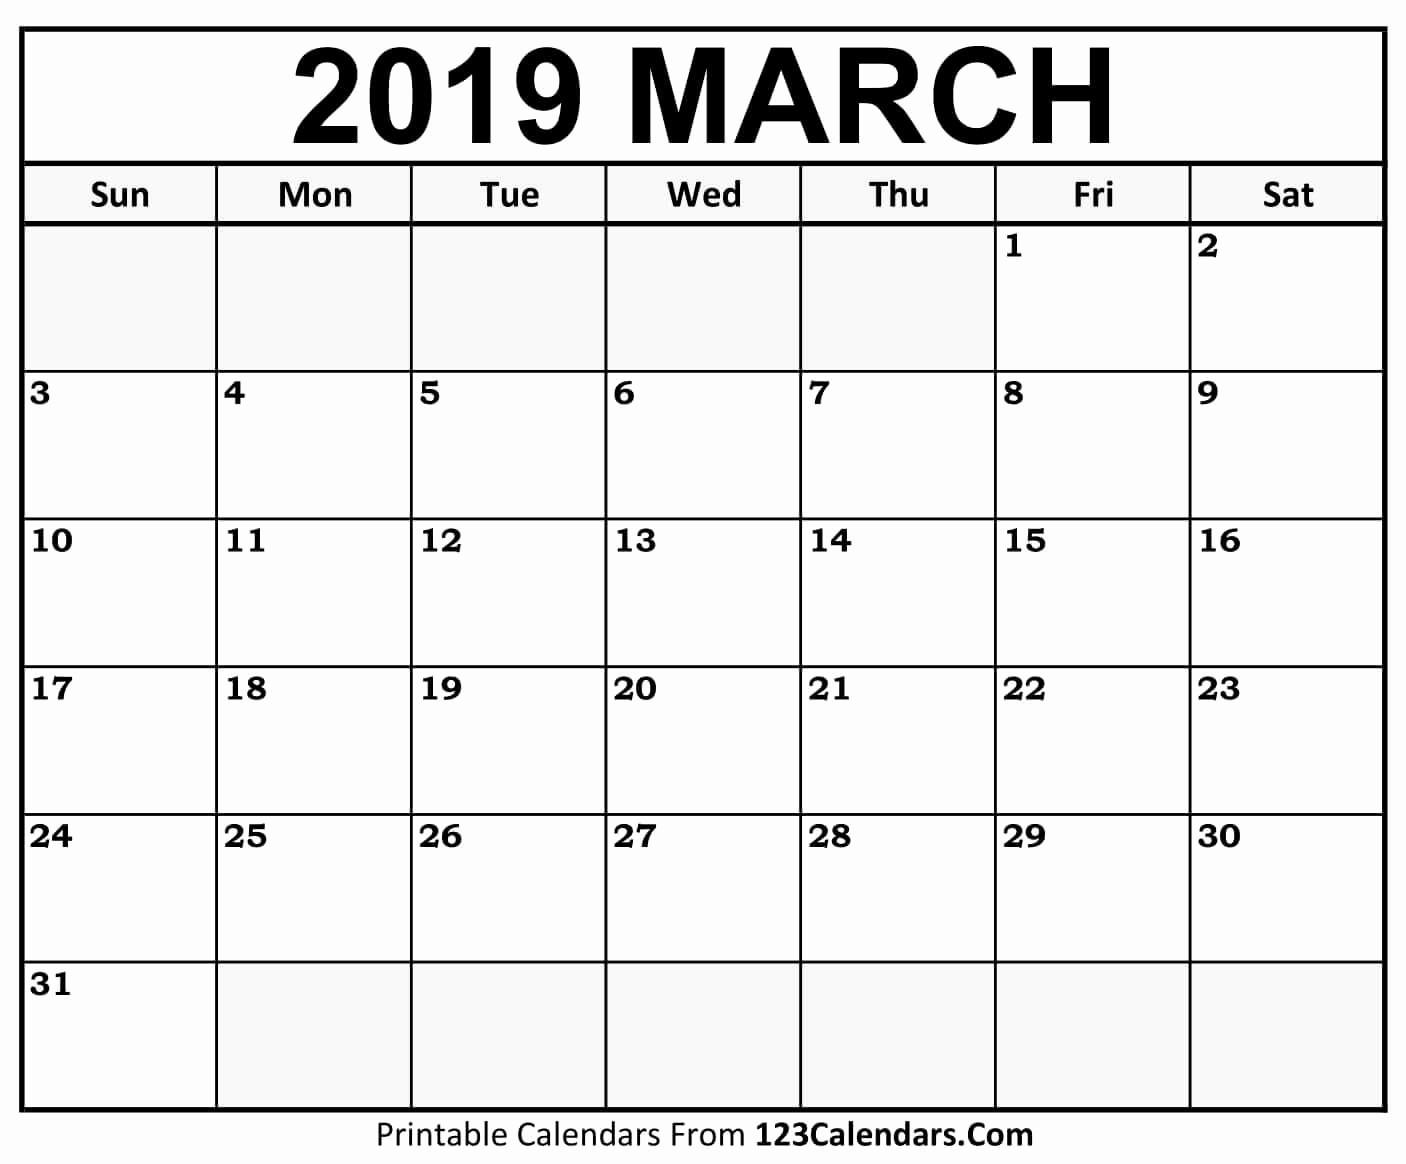 Printable Calendar 2018 and 2019 Unique Printable March 2018 Calendar Templates 123calendars